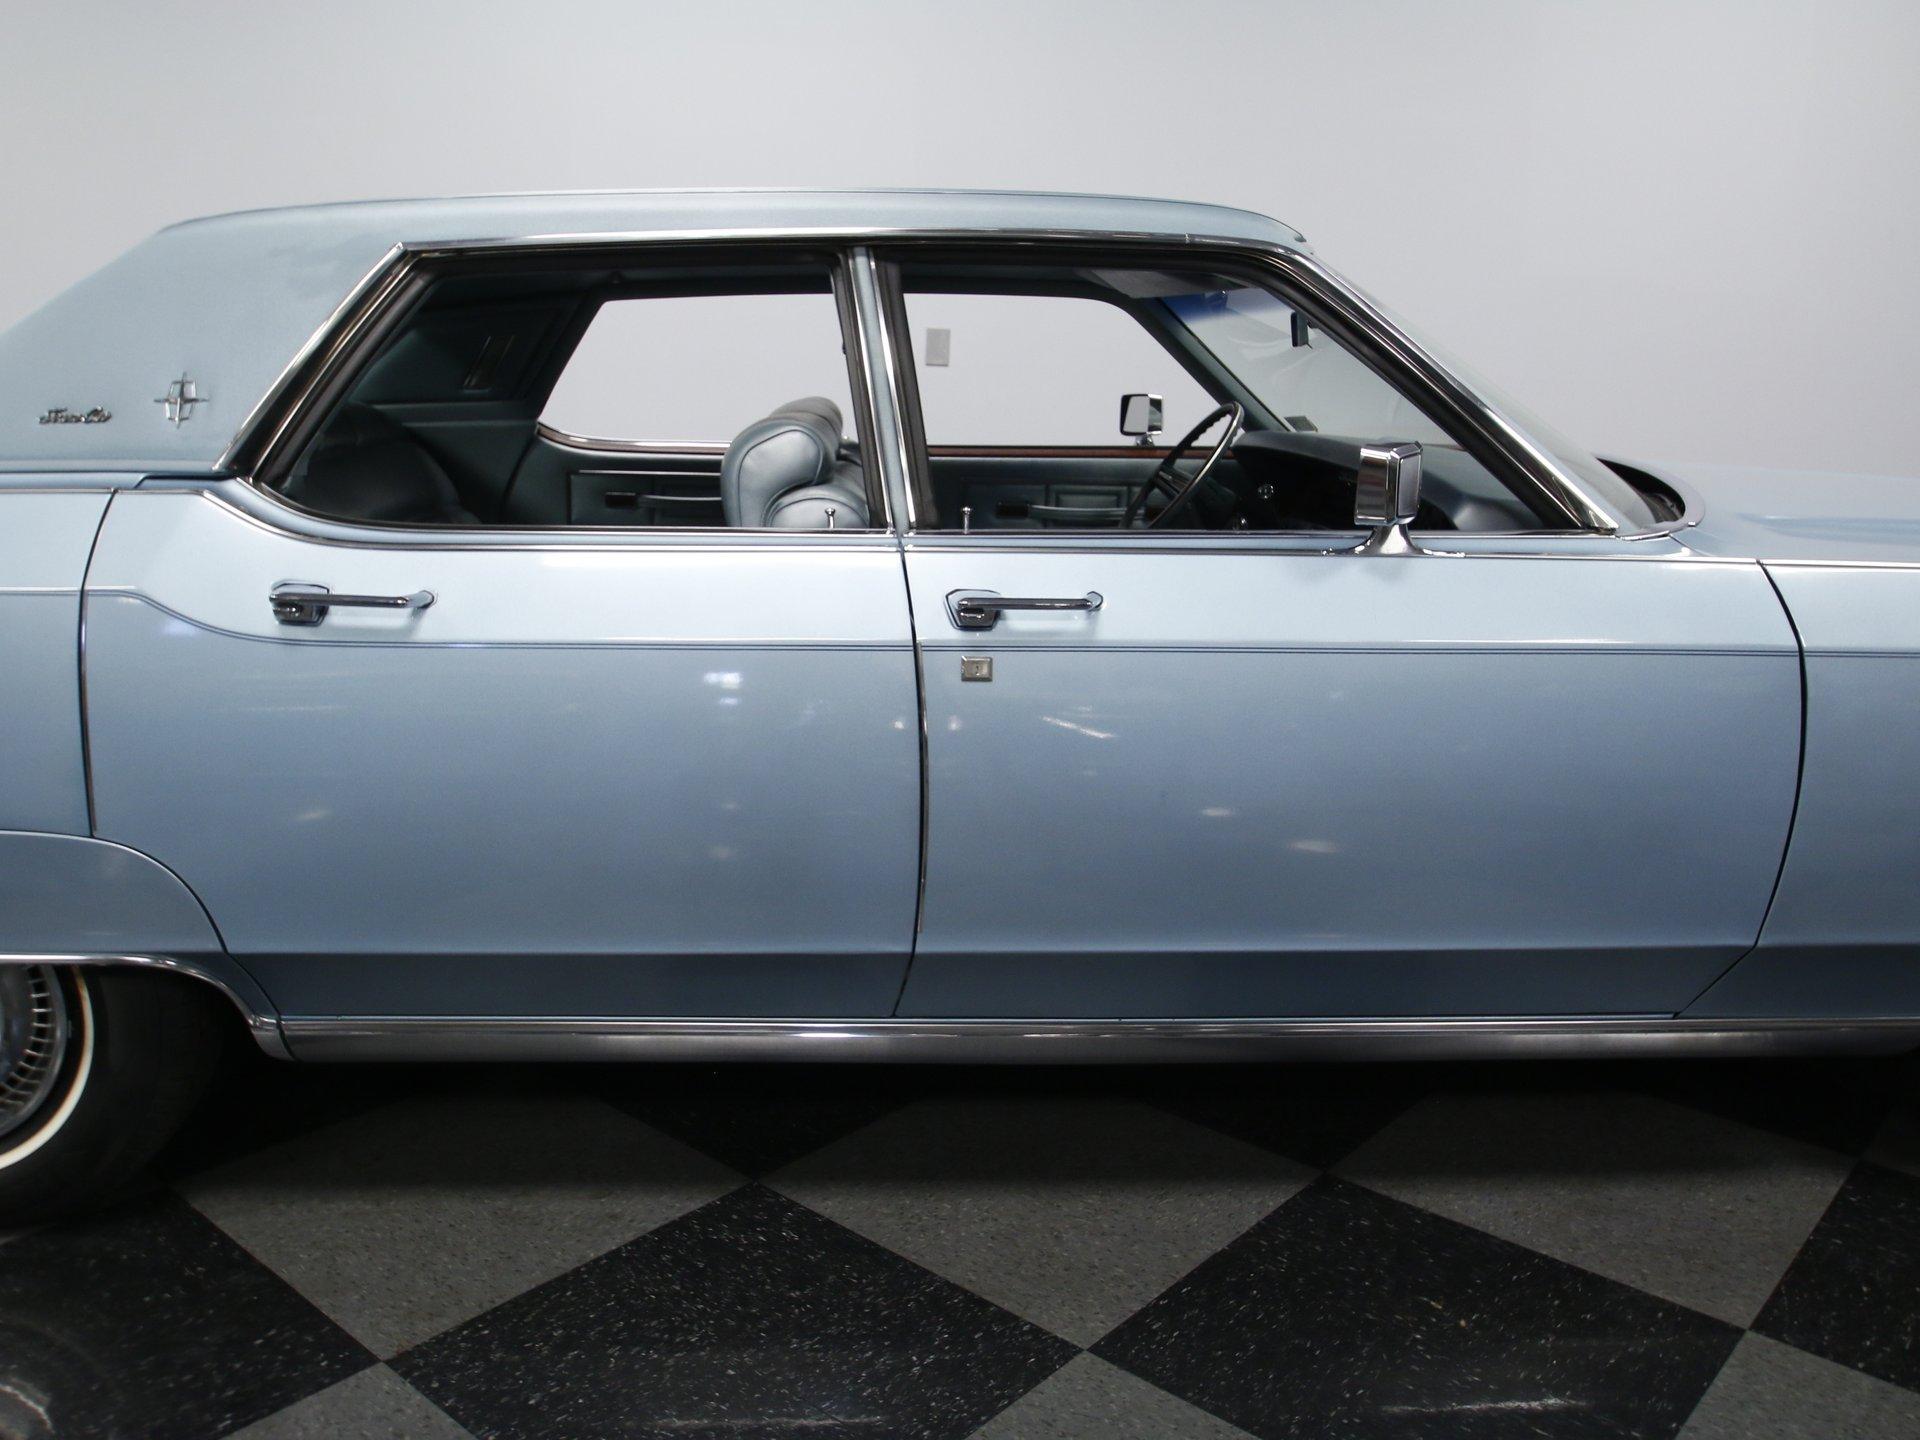 1974 Lincoln Continental Streetside Classics The Nation S